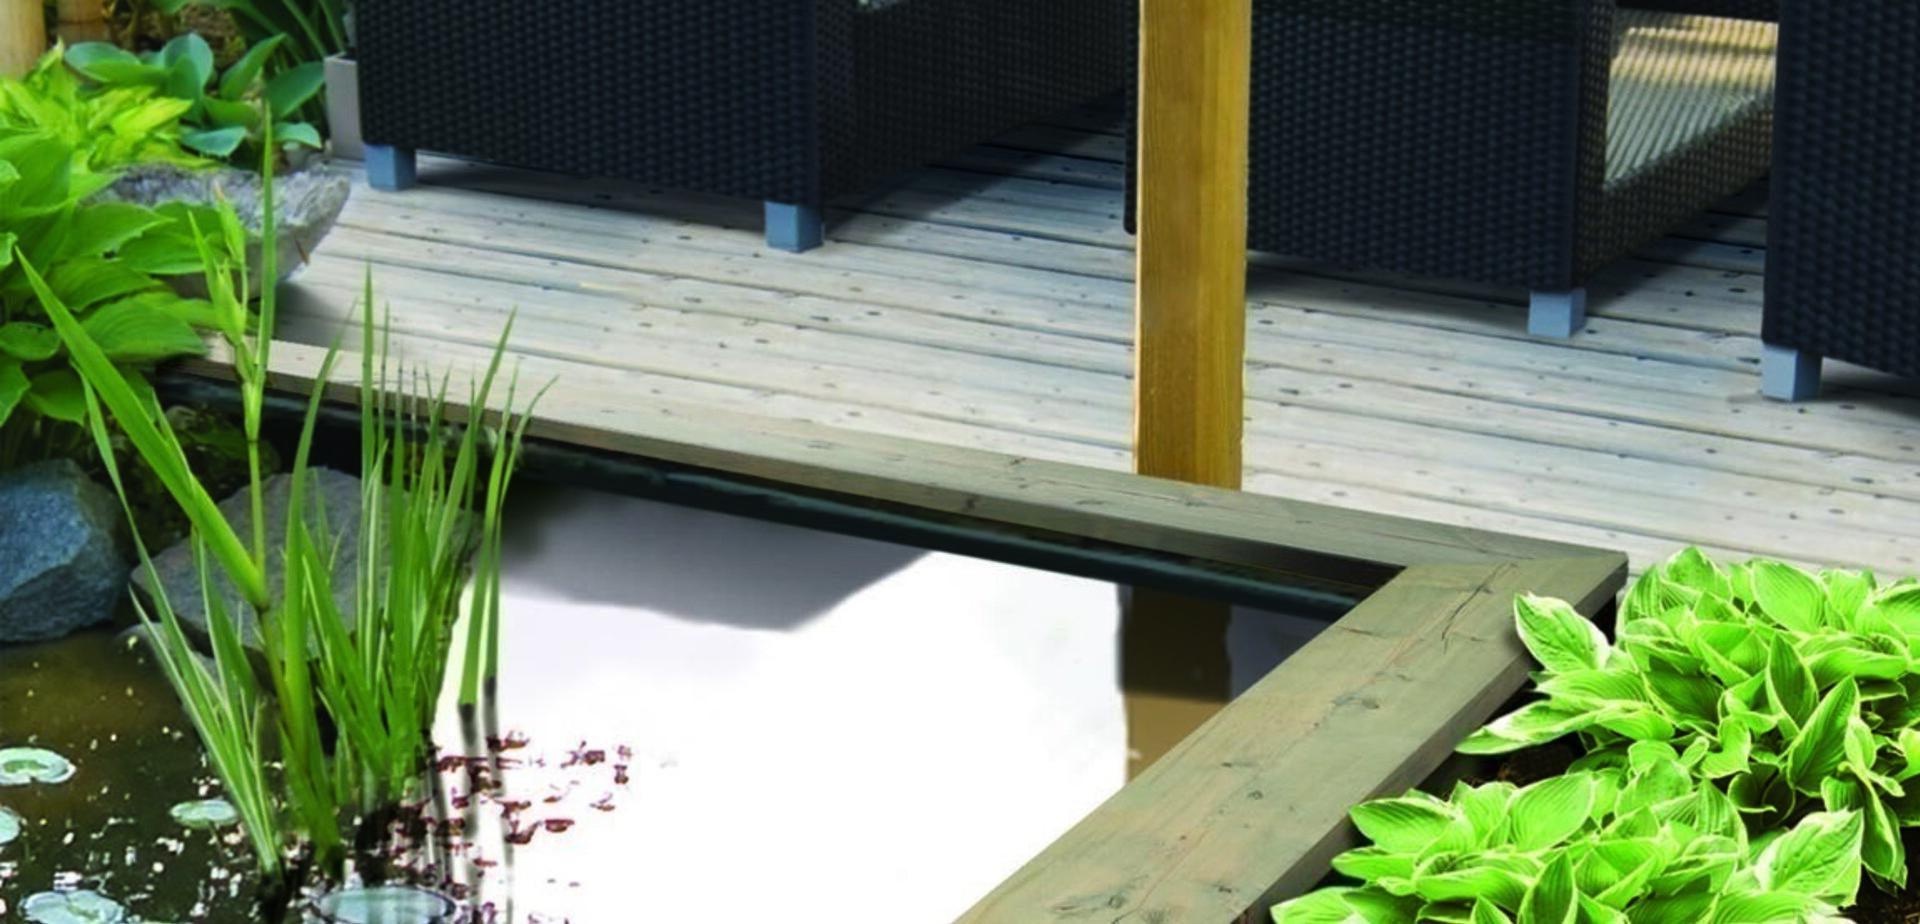 Construire Son Bassin De Jardin construire un bassin de jardin | Étape par étape | brico.be